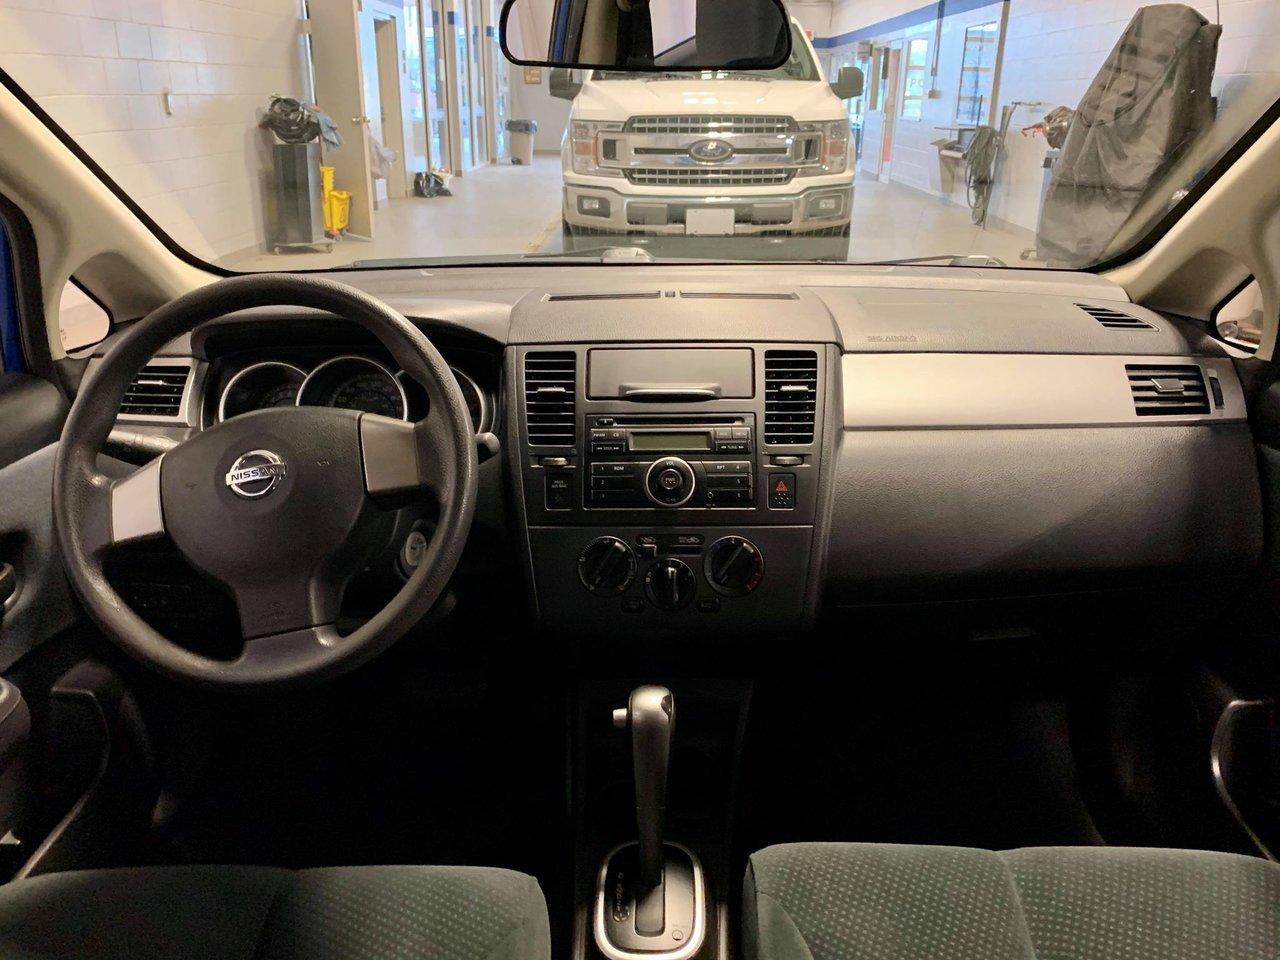 2010 Nissan Versa 5dr HB I4 Auto 1.8 S JAMAIS ACCIDENTEE